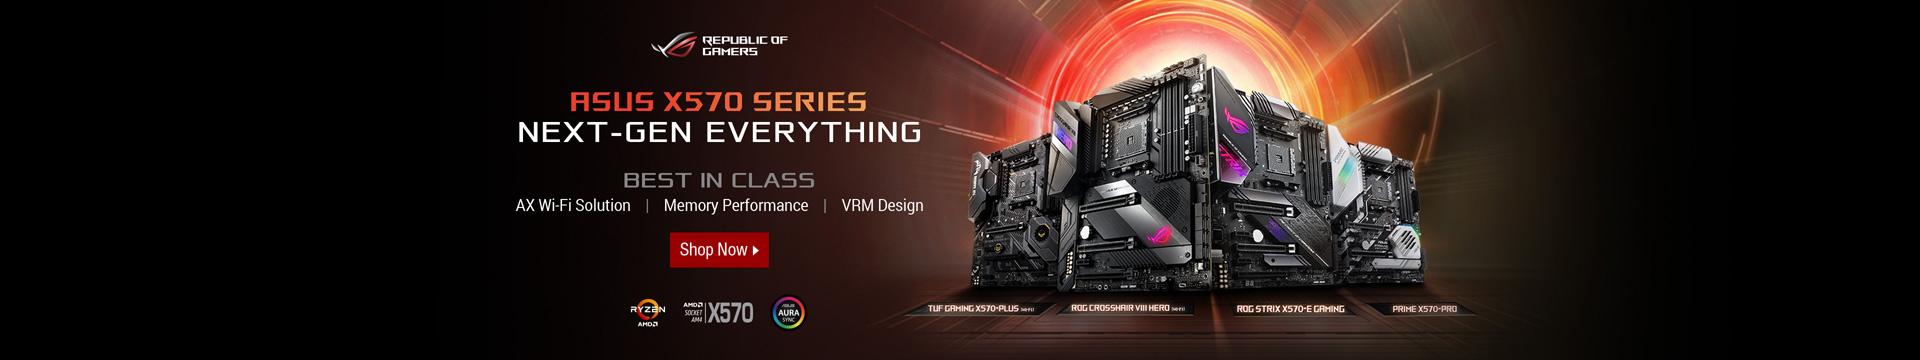 AMD Motherboards, AMD Athlon Motherboard, Athlon 64